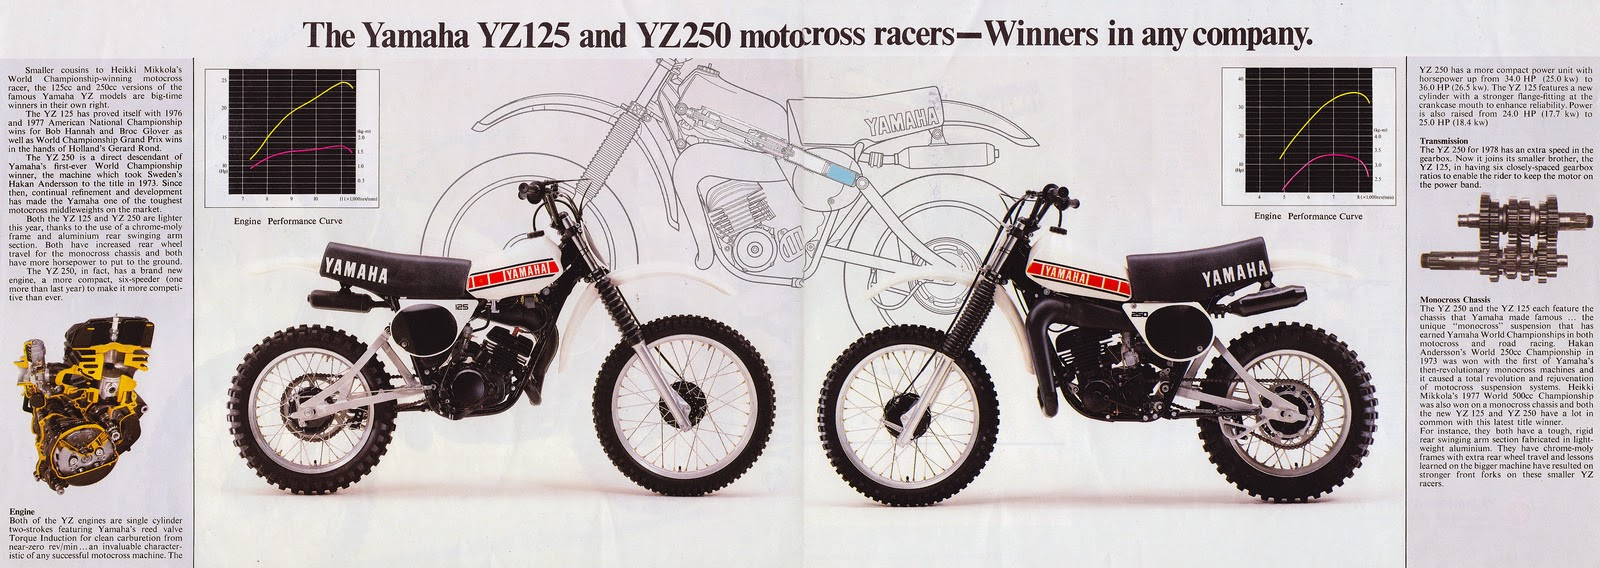 racing caf vintage brochures yamaha yz 125 250 1978 wiring diagram also yz 125 clutch on 89 in addition suzuki gsx r 750 [ 1600 x 568 Pixel ]